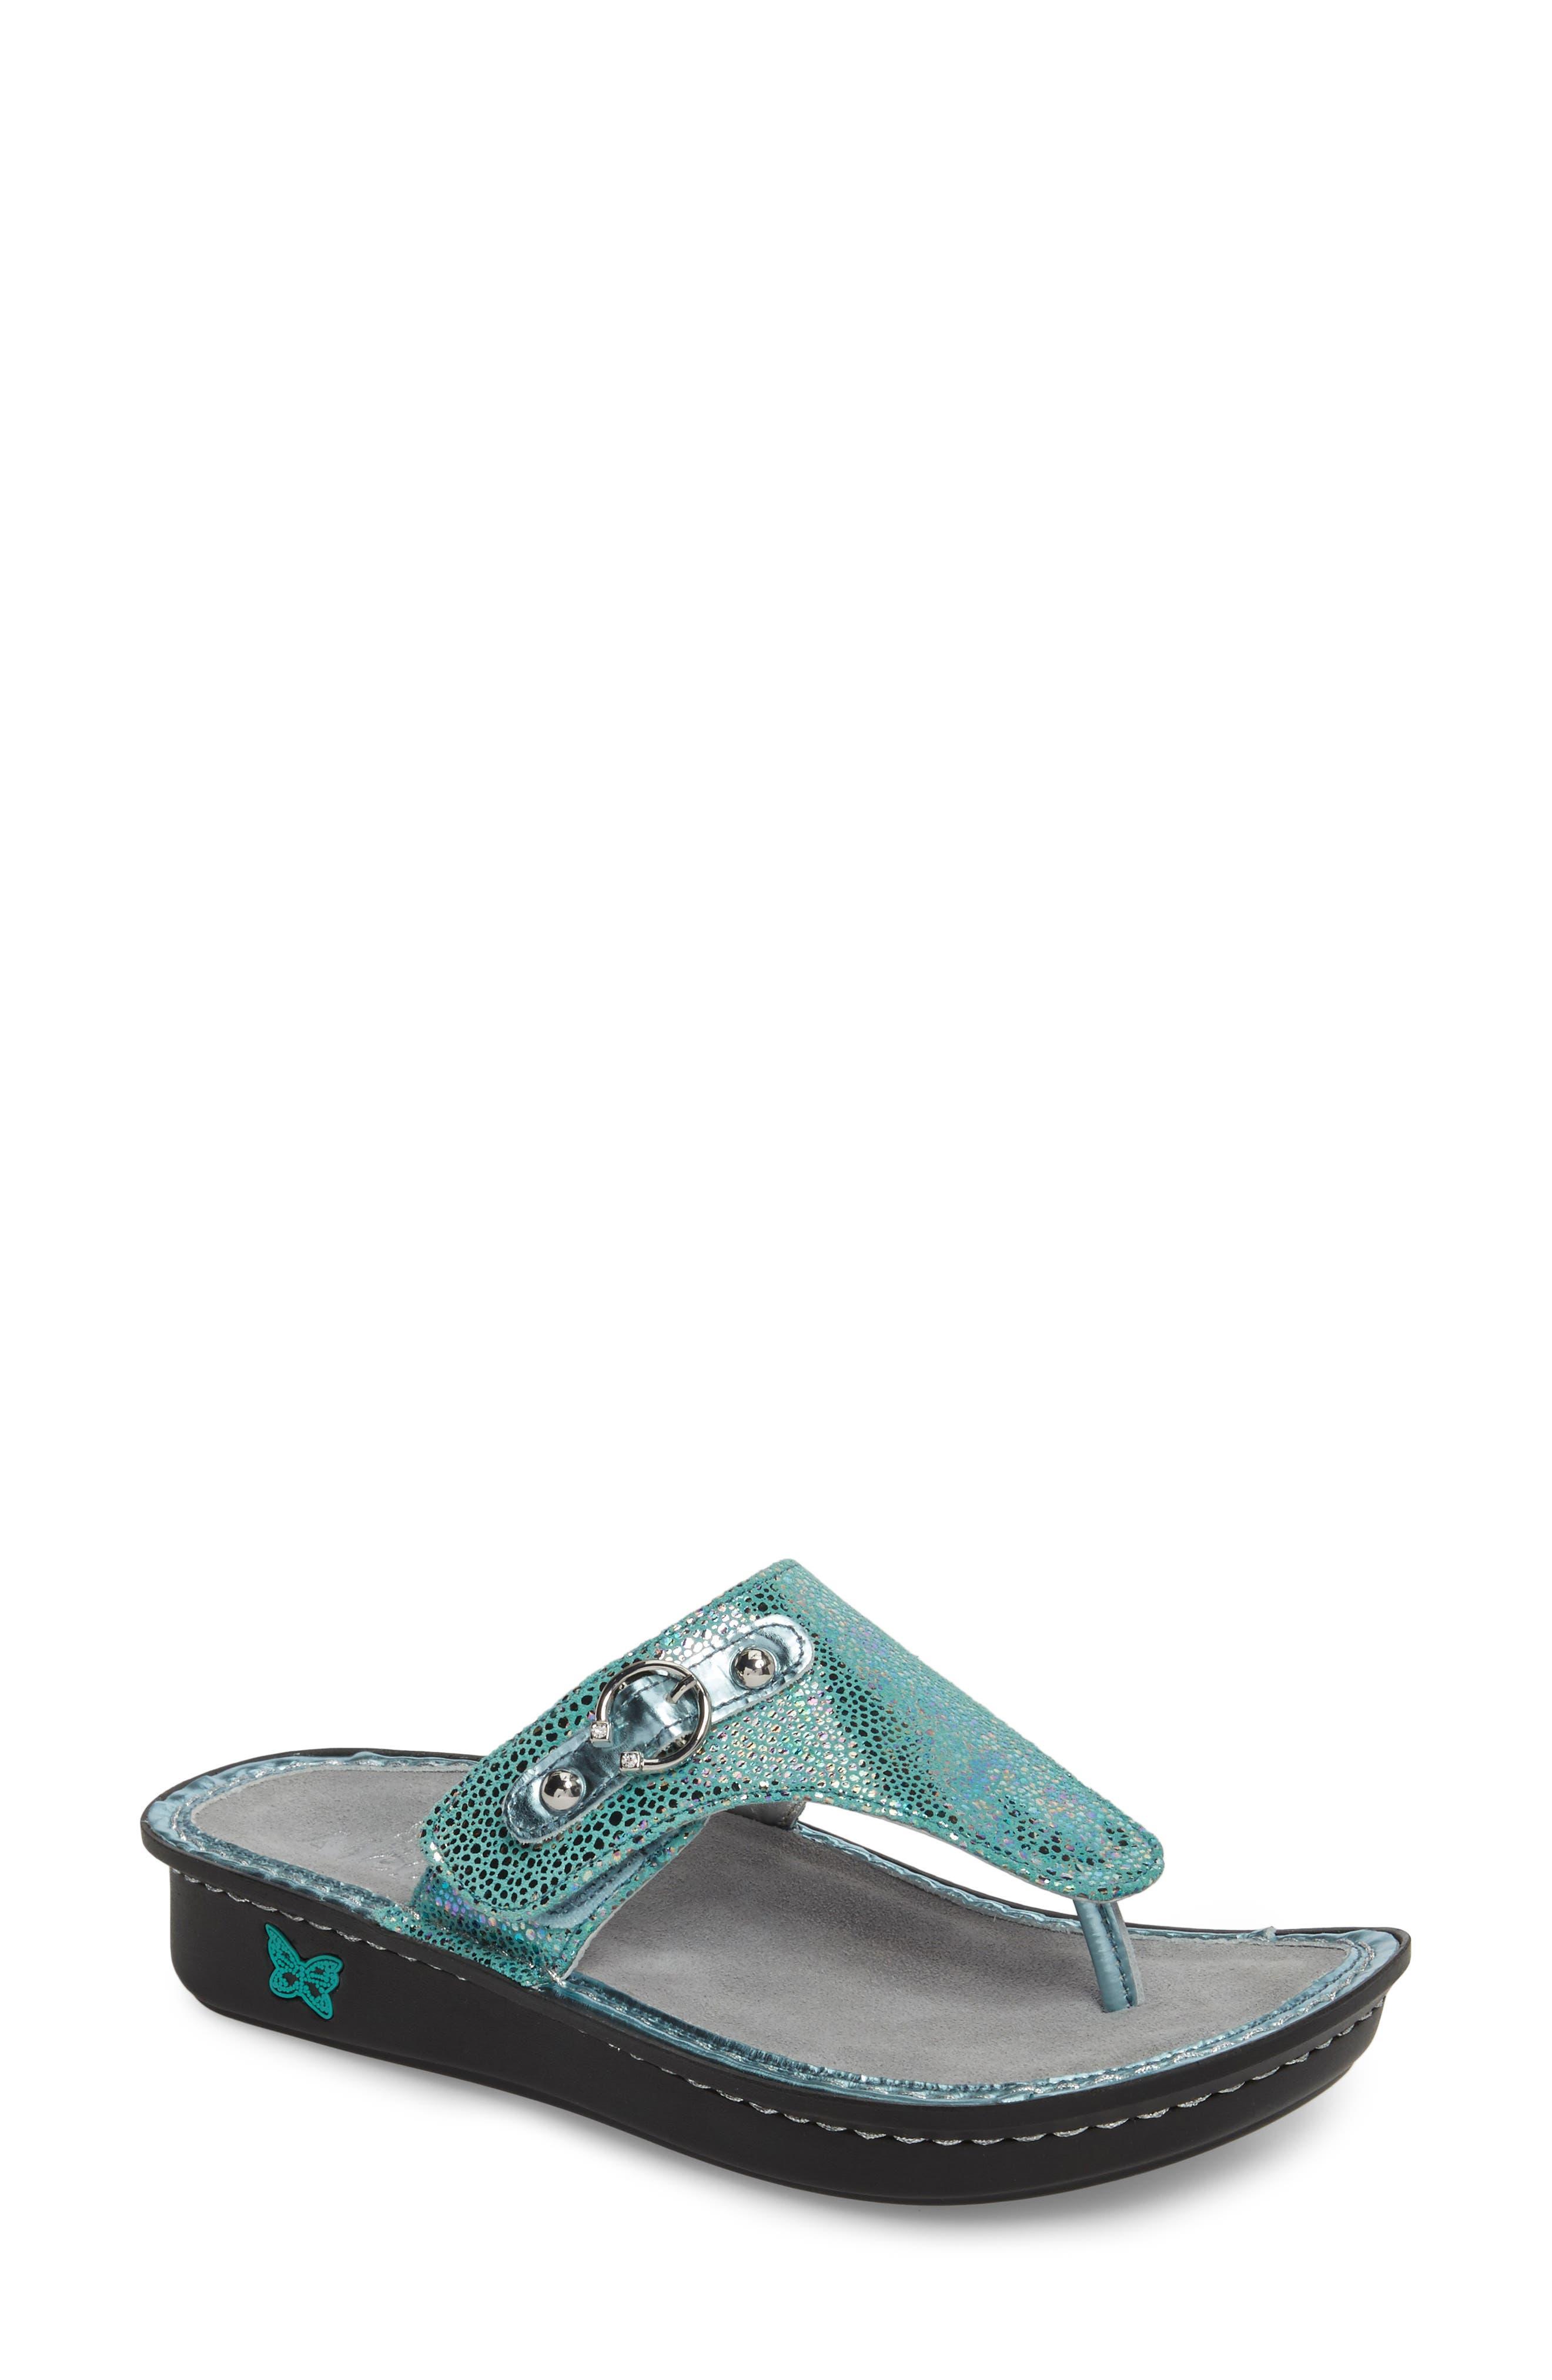 'Vanessa' Thong Sandal,                         Main,                         color, Aqua Love Leather